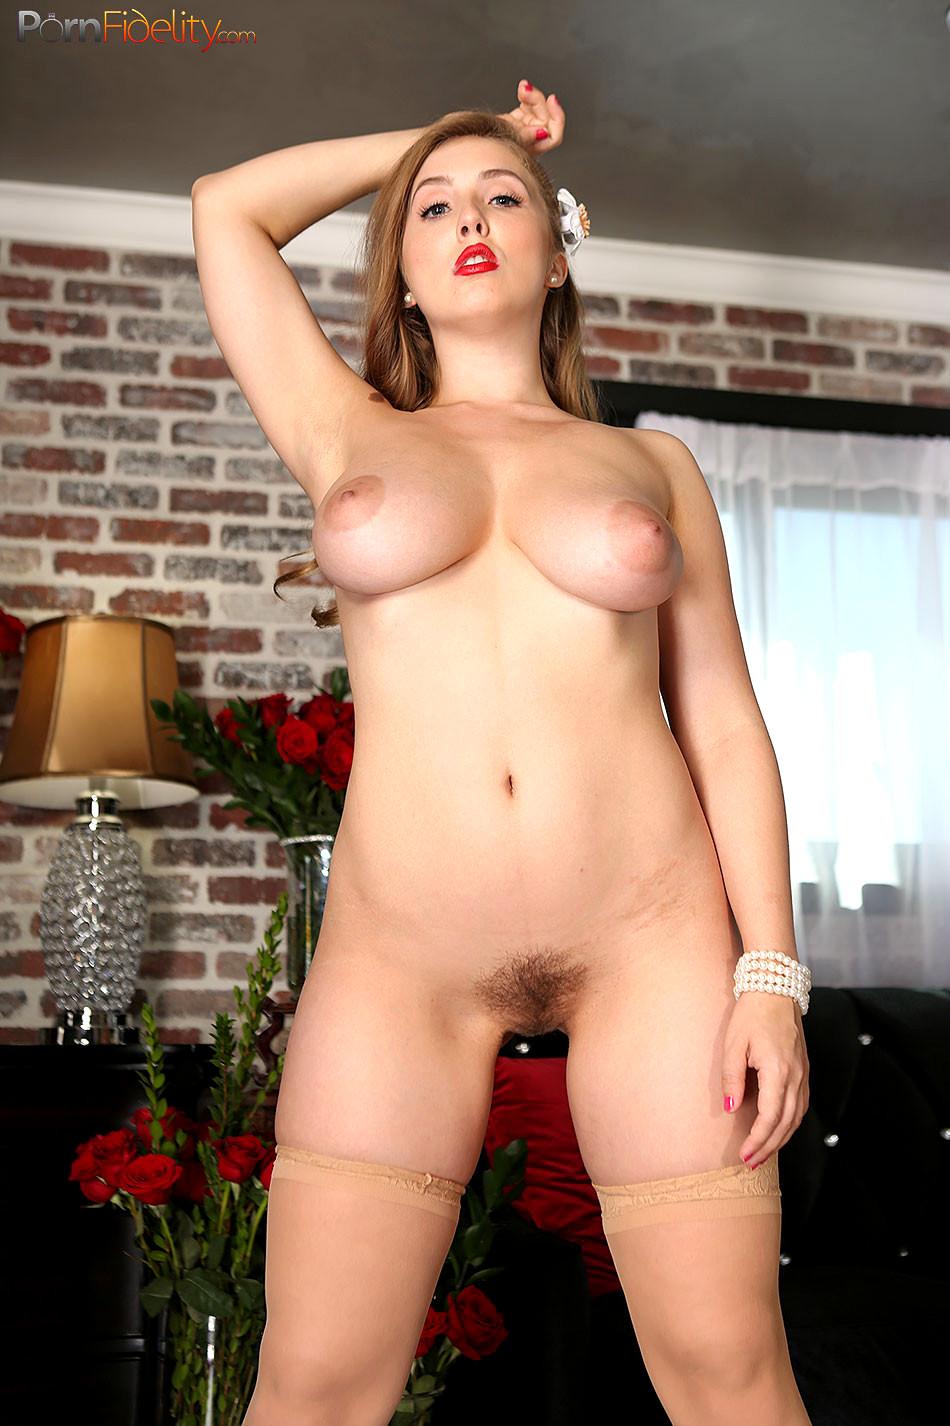 Lena paul 4k porn